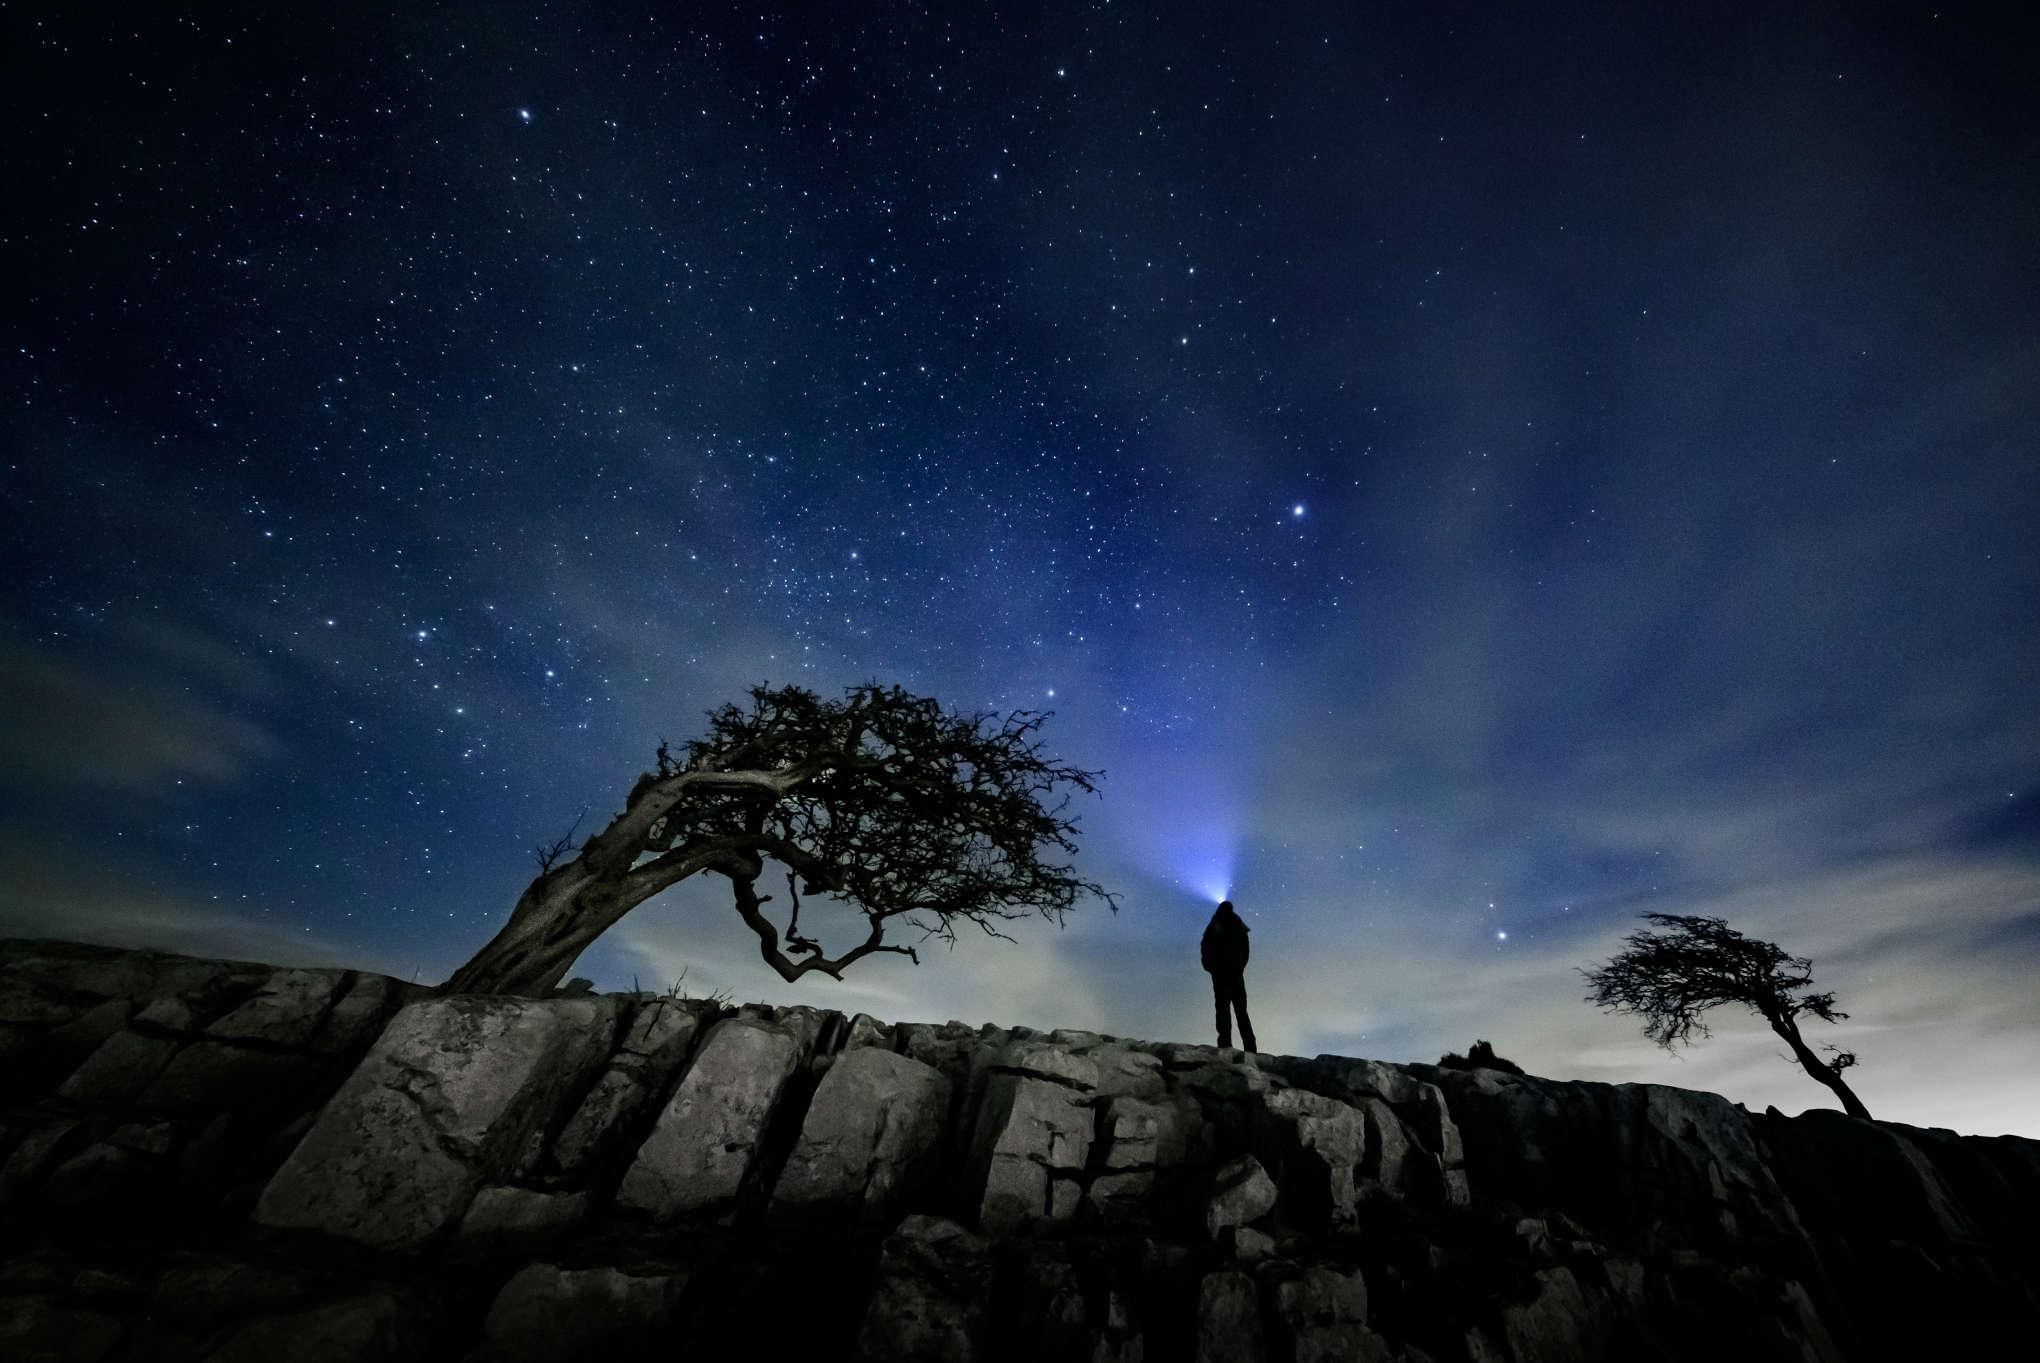 Twistleton Scar - photographer Cr. Danny Lawson